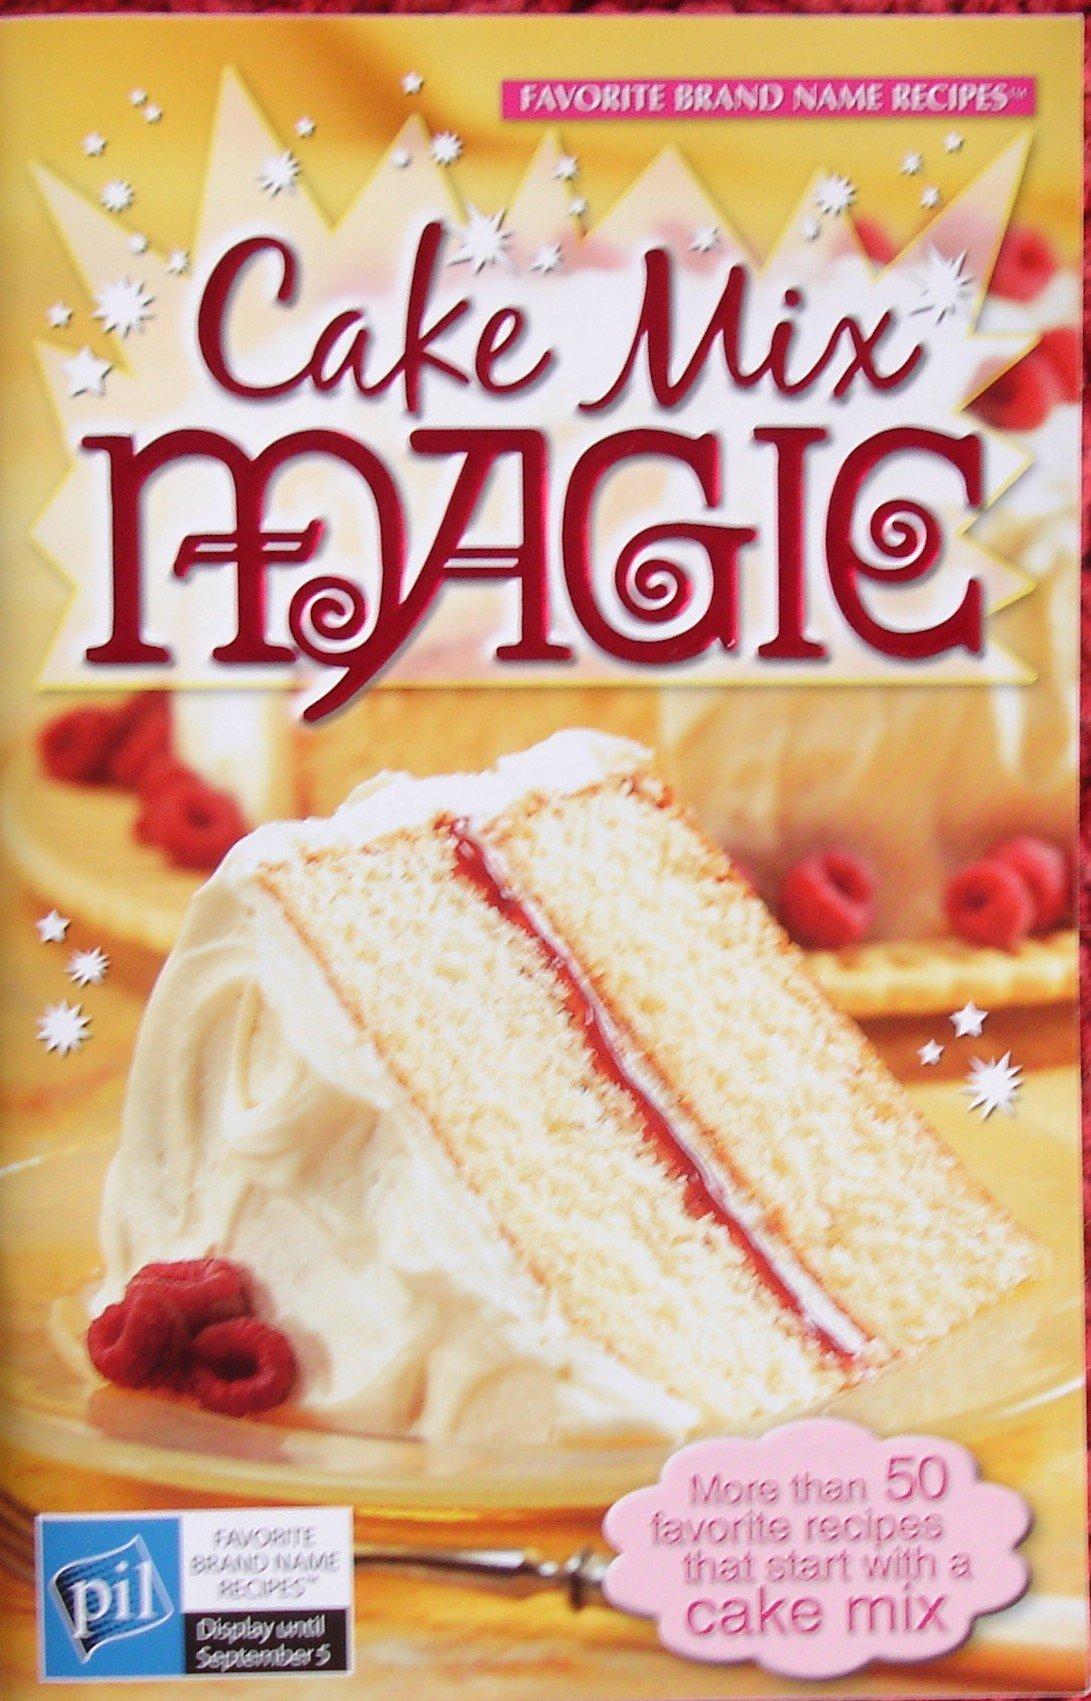 Download Cake Mix Magic ... More than 50 favorite recipes that start with a cake mix (Vol 8, No 20) PDF